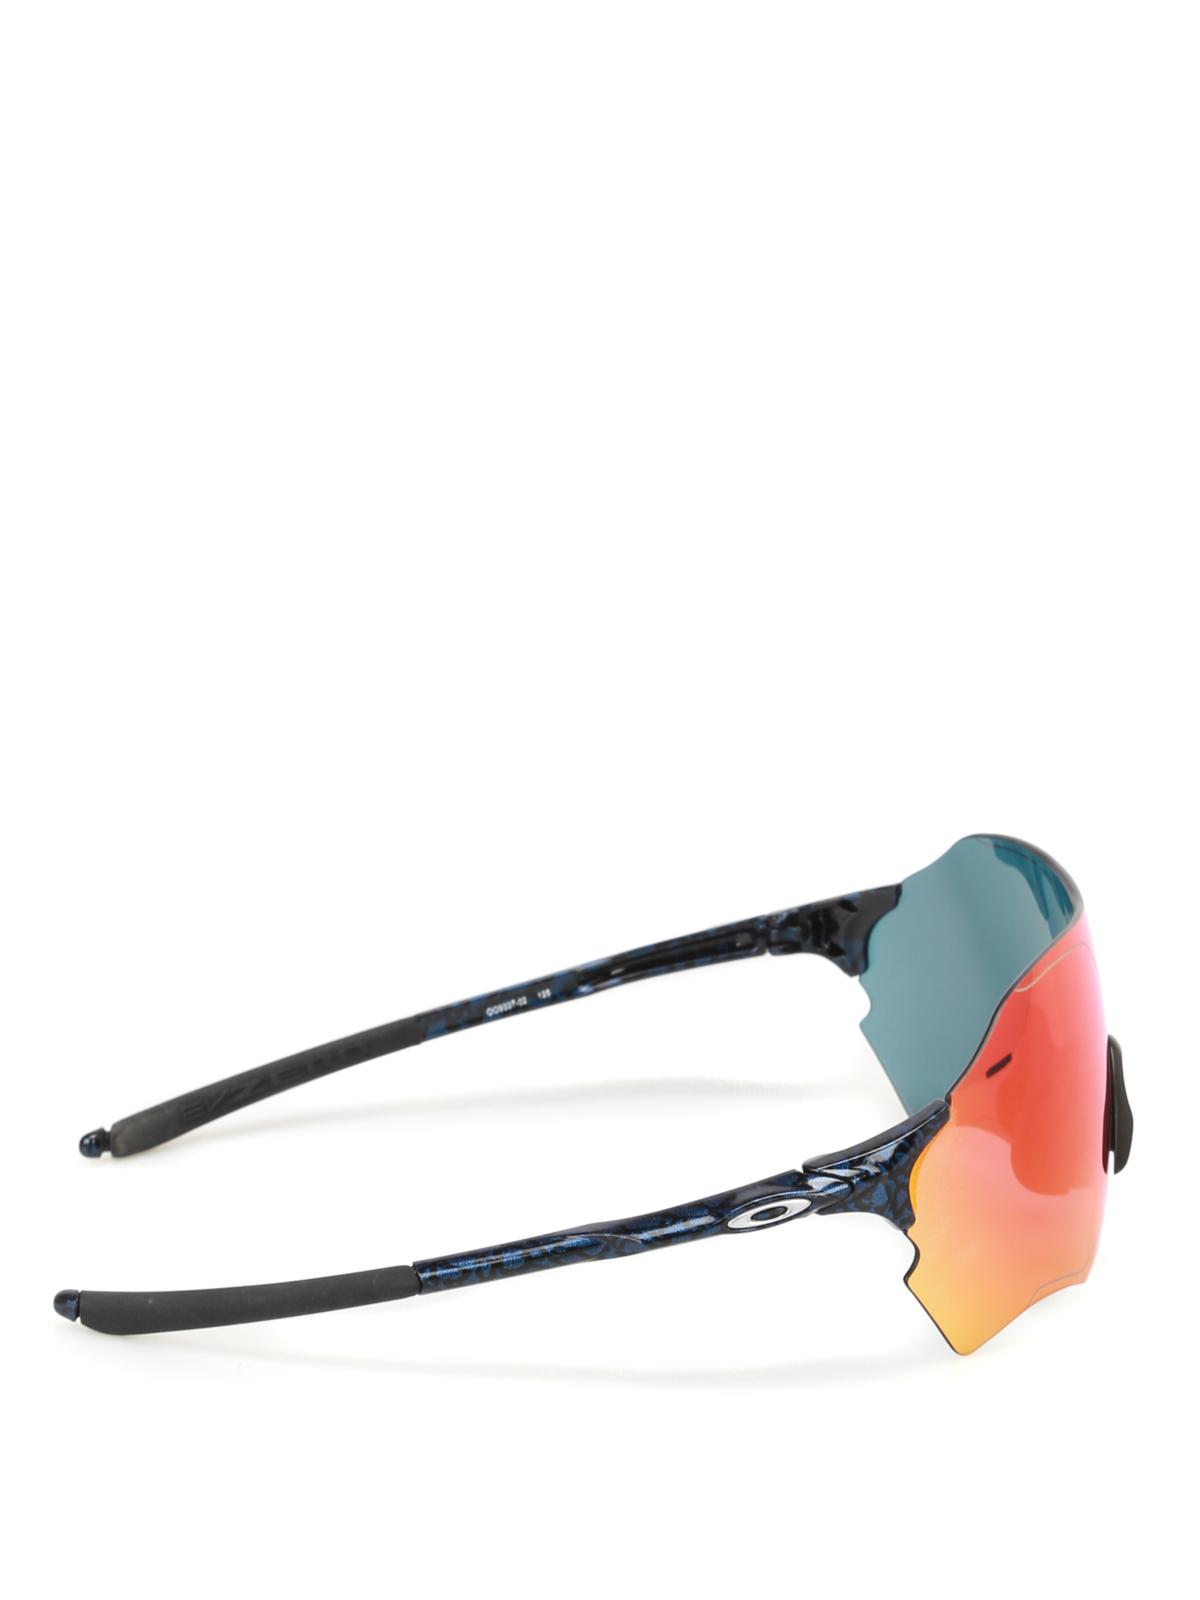 1e9d35f84c discount code for oakley oo9313 evzero path sunglasses 4064b ba4b0   discount code for oakley sunglasses online evzero range asia fit glasses  650a9 4a63d